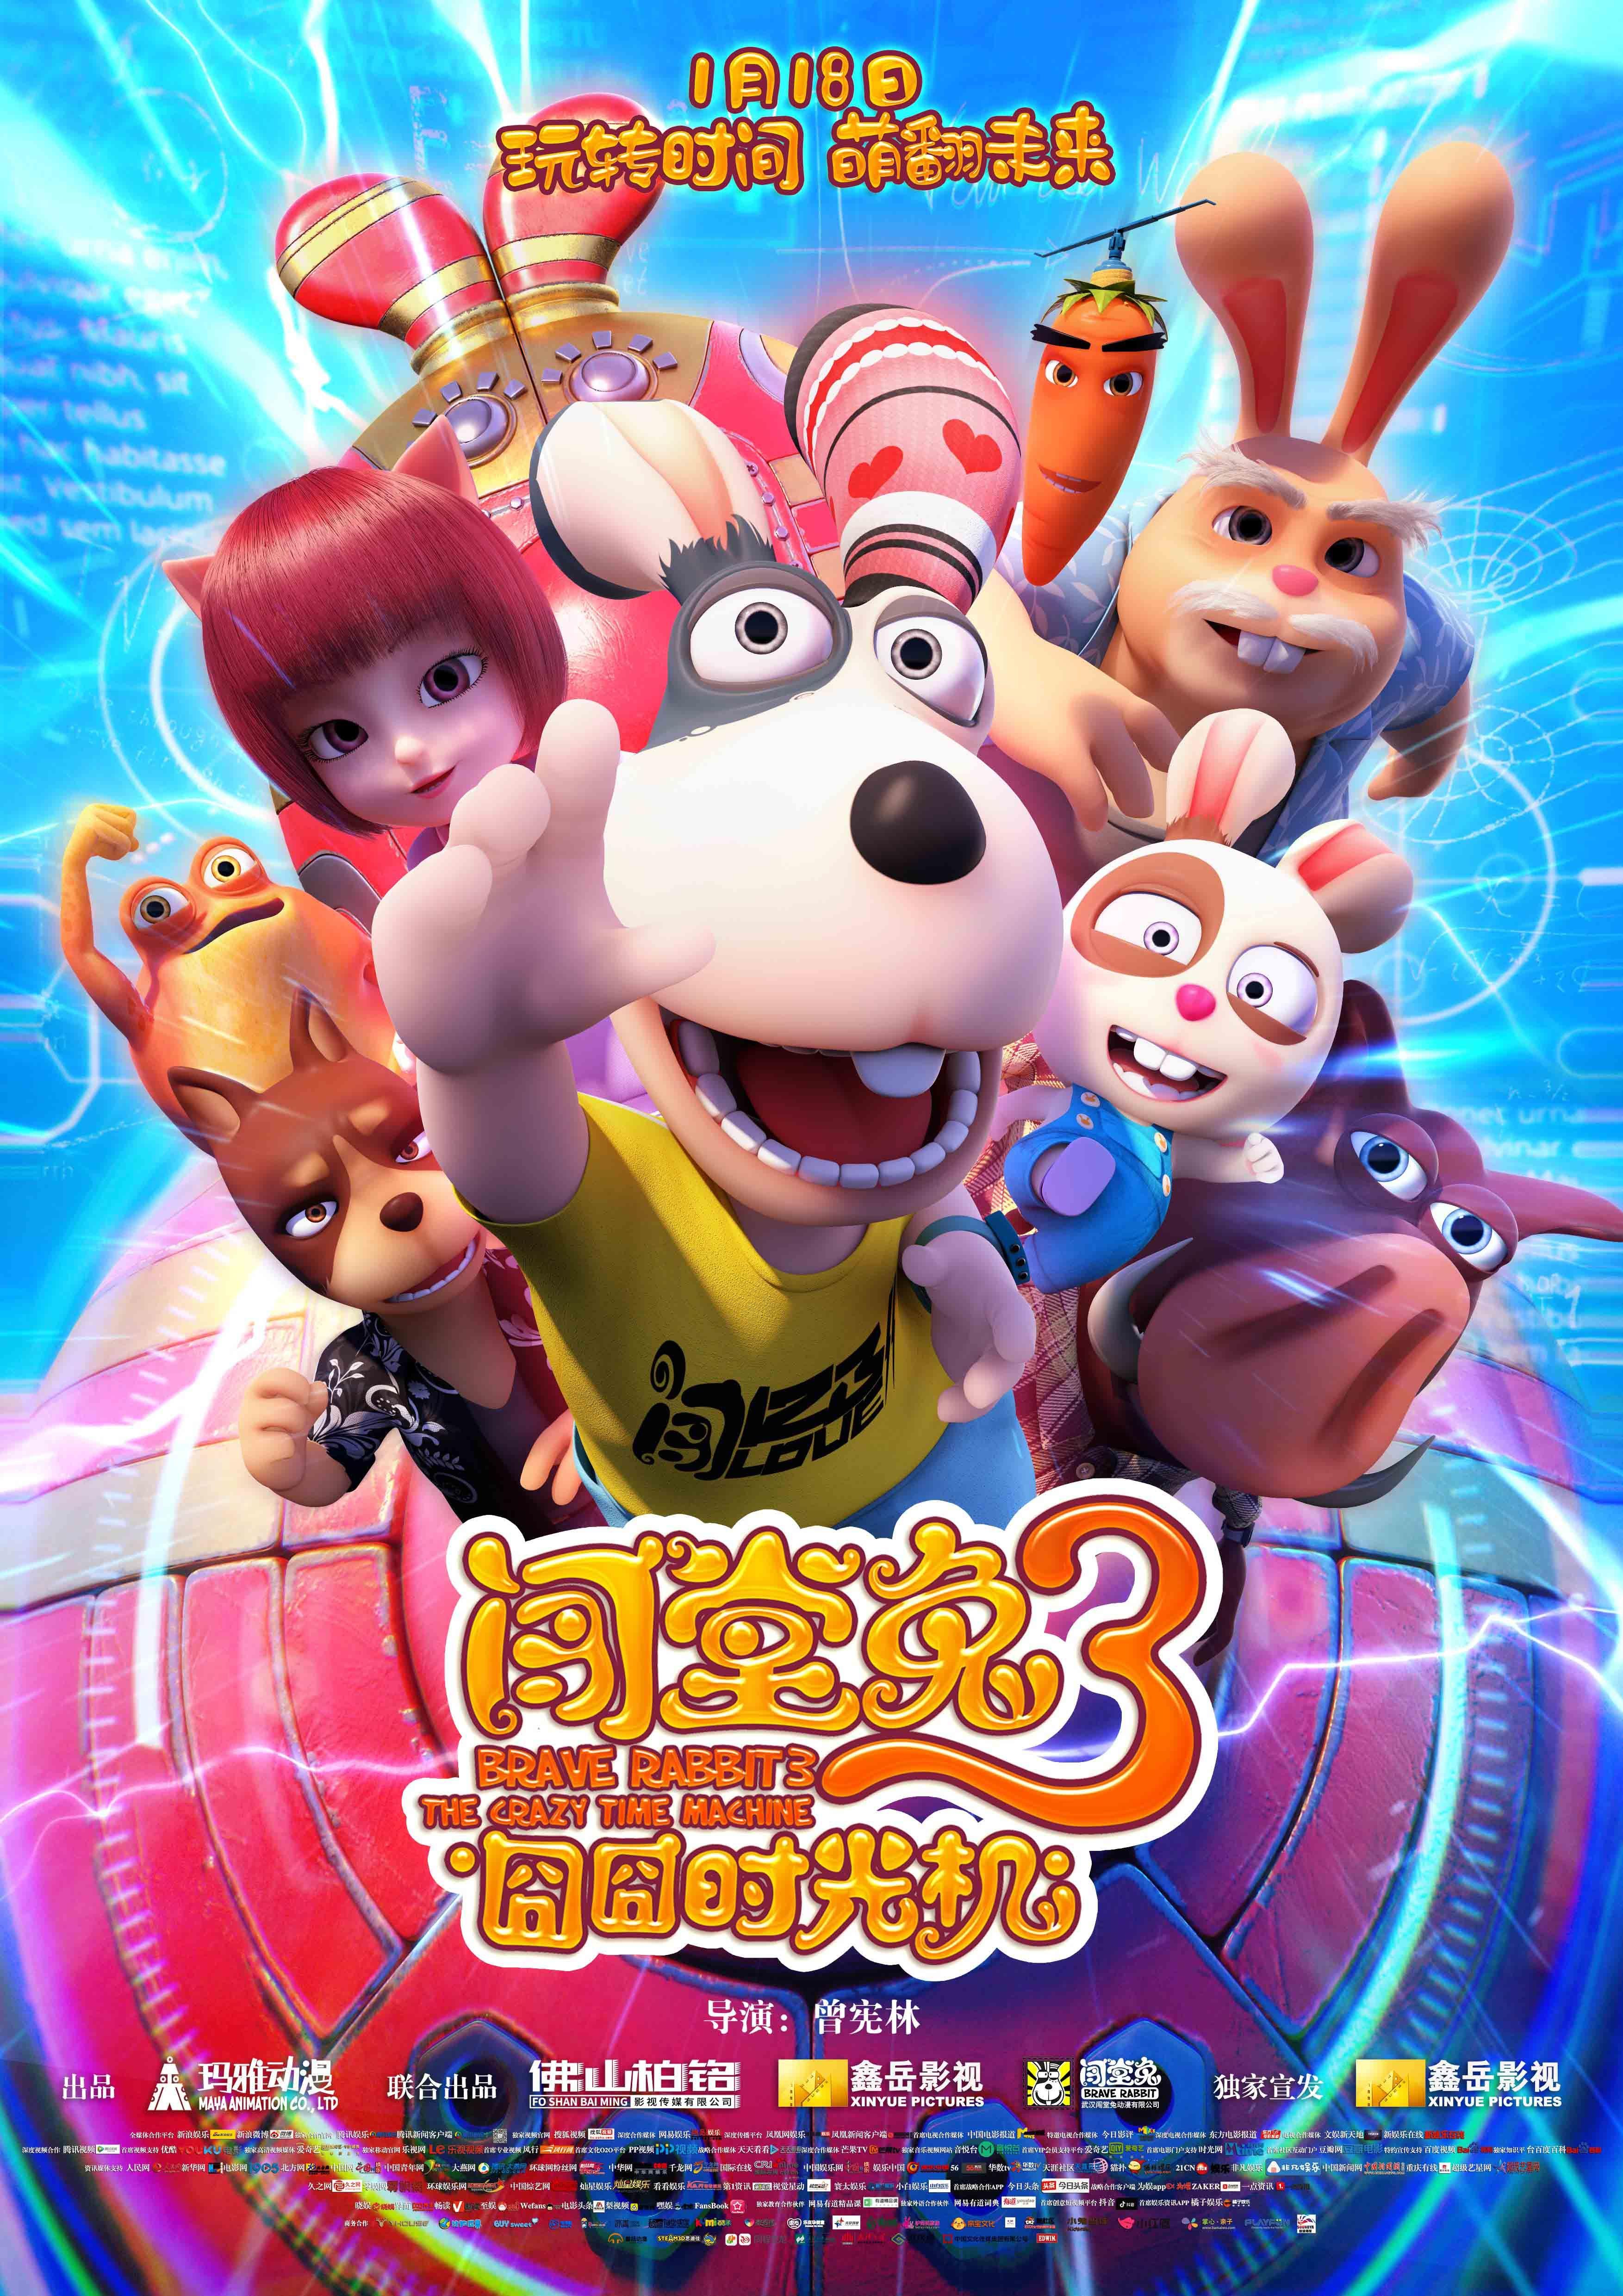 闯堂兔3囧囧时光机Brave Rabbit3 The Crazy Time Machine